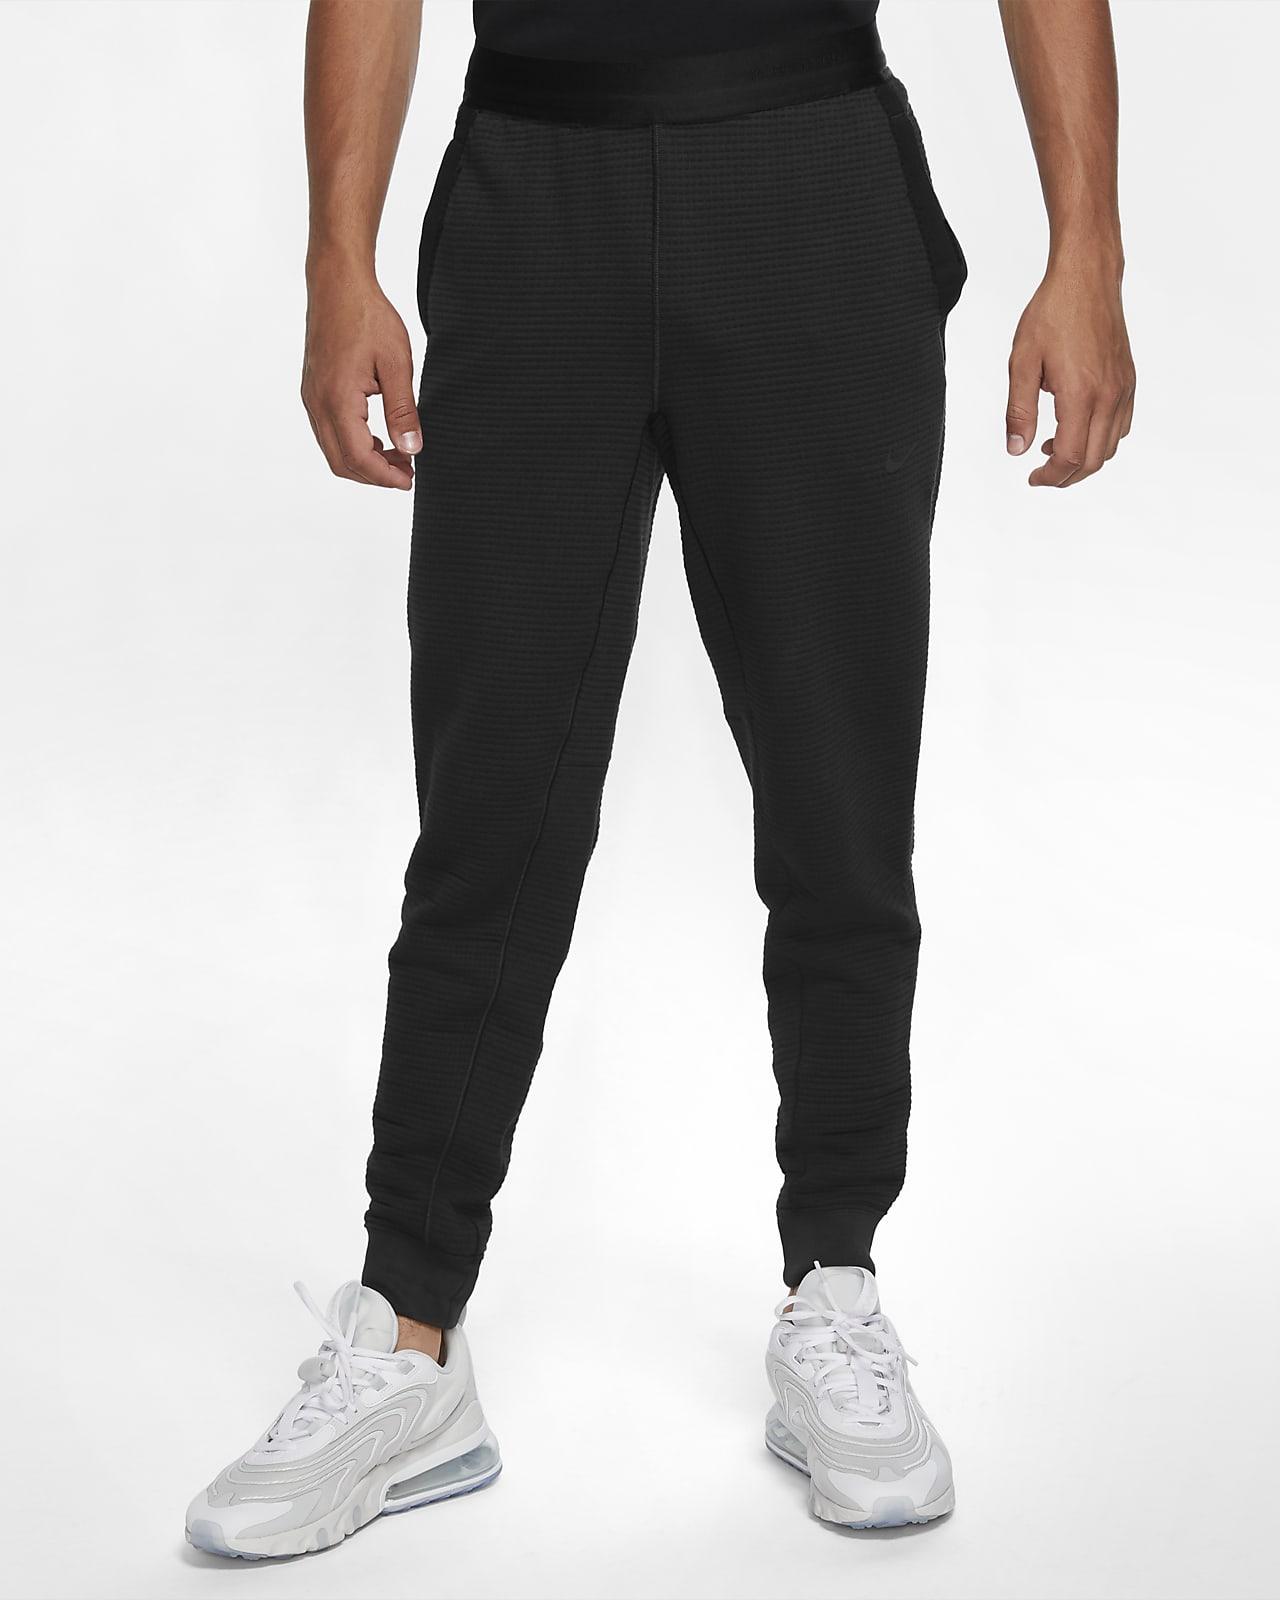 seta Perjudicial Superposición  Nike Sportswear Tech Pack Men's Engineered Trousers. Nike SA